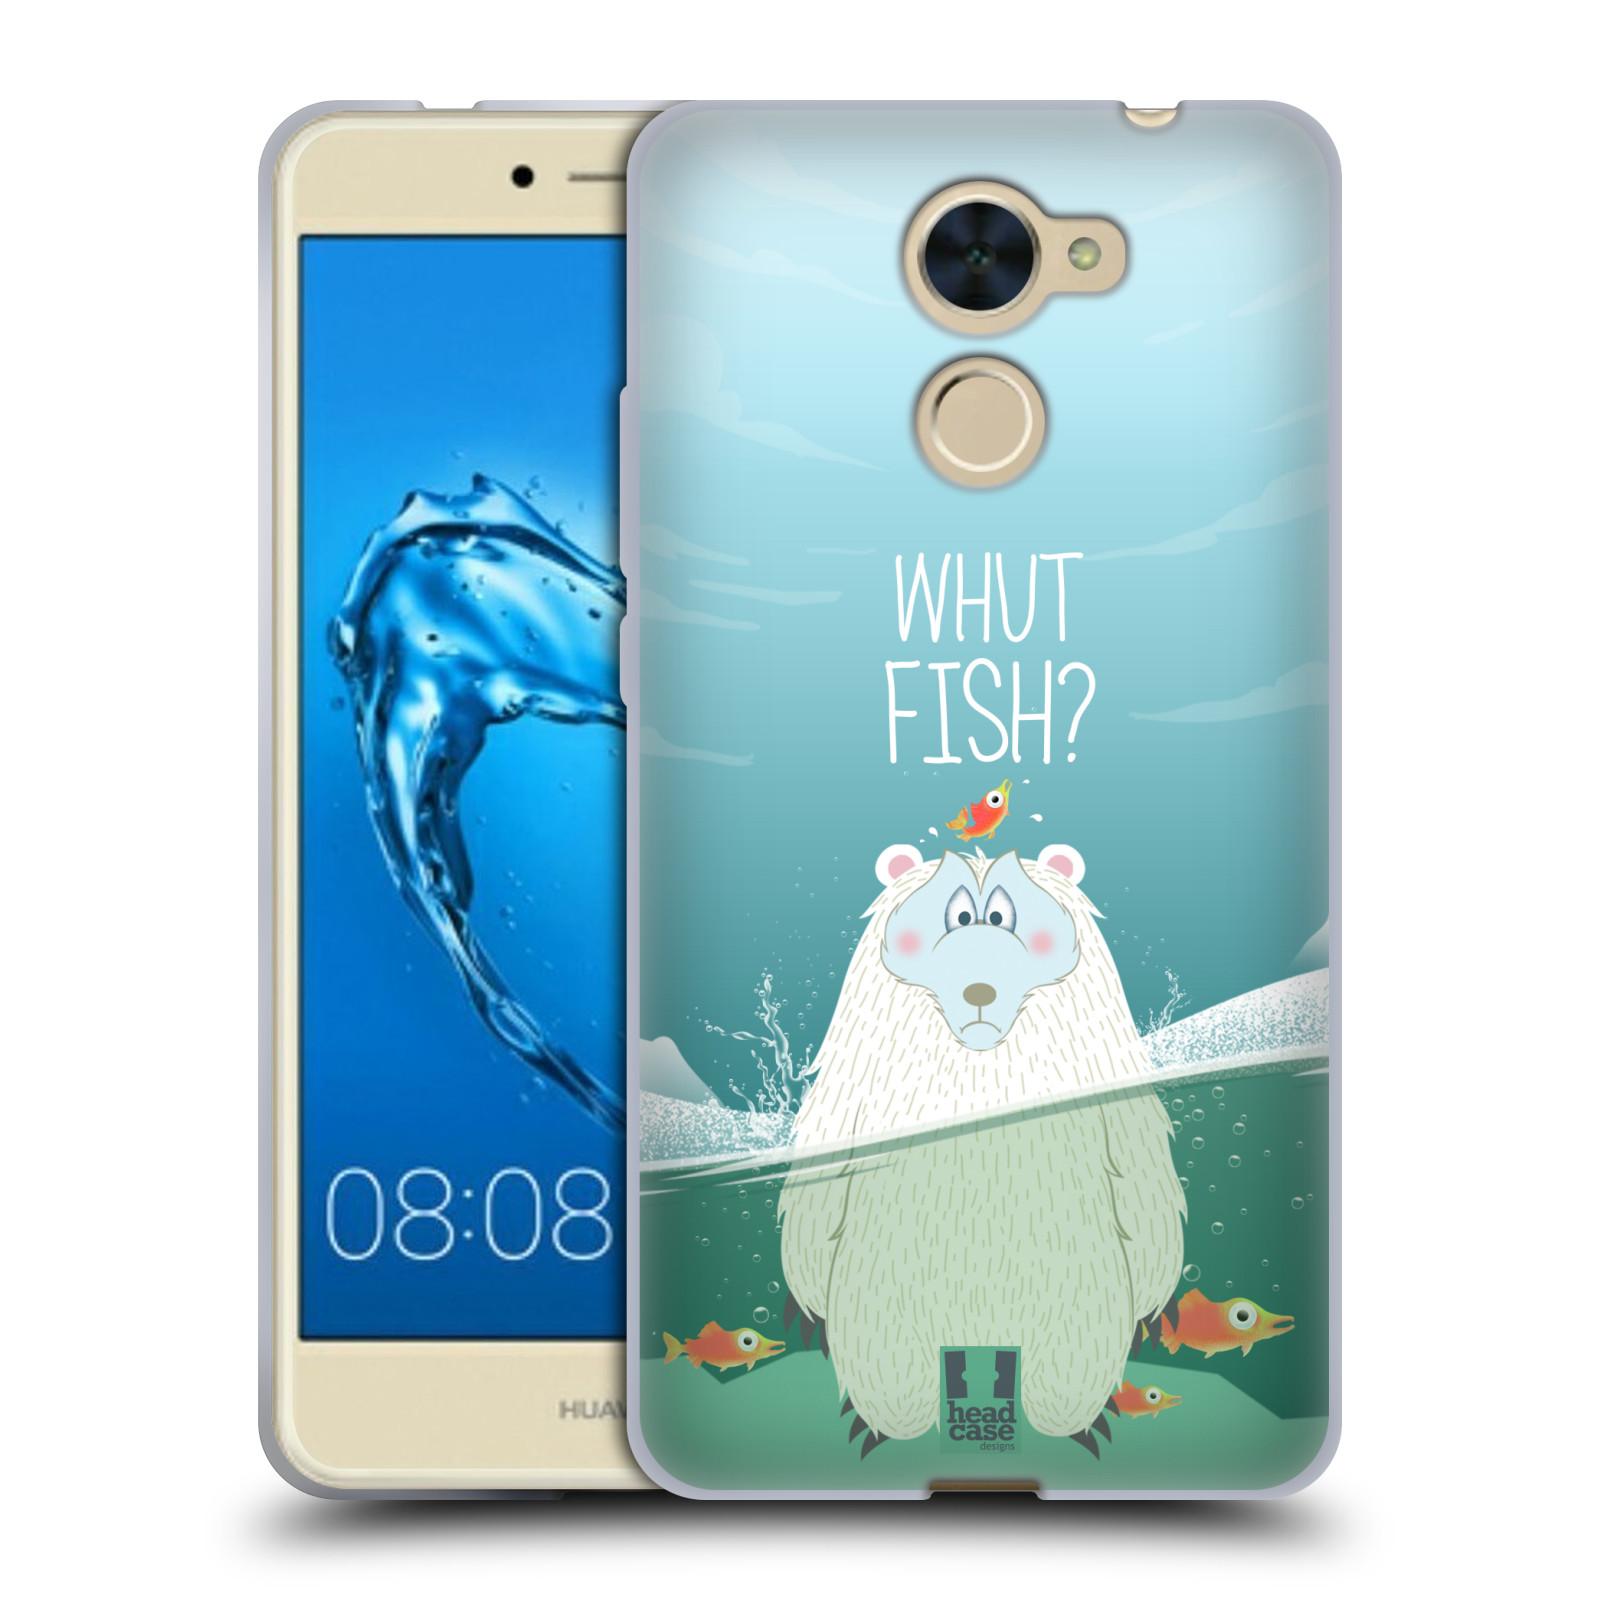 Silikonové pouzdro na mobil Huawei Y7 - Head Case - Medvěd Whut Fish?